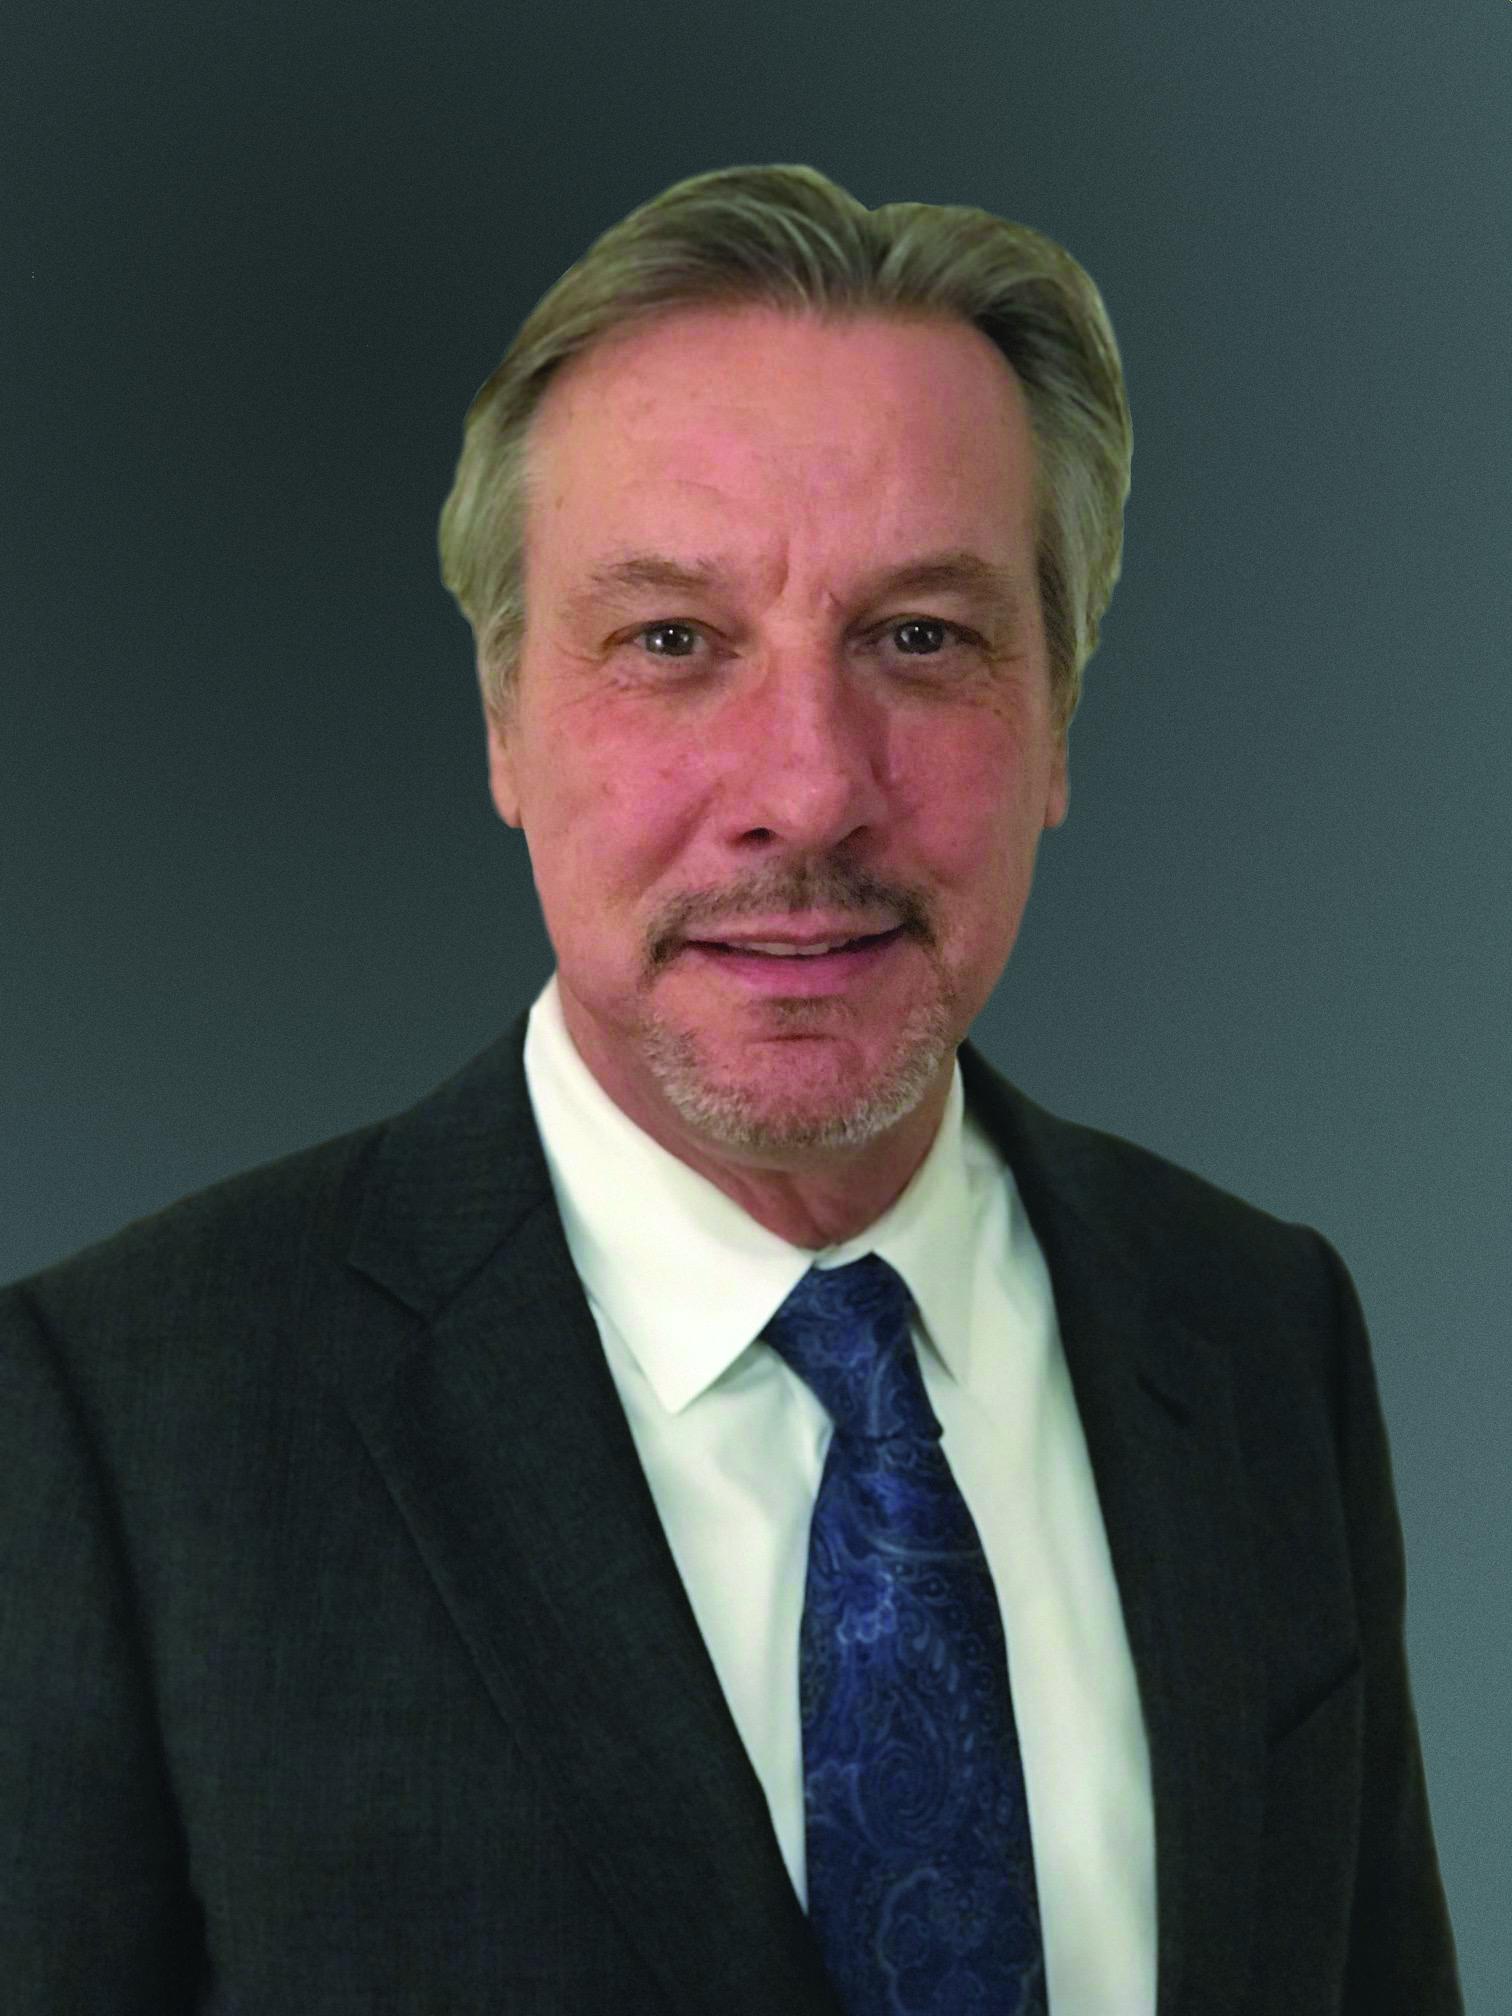 Mark McGivern